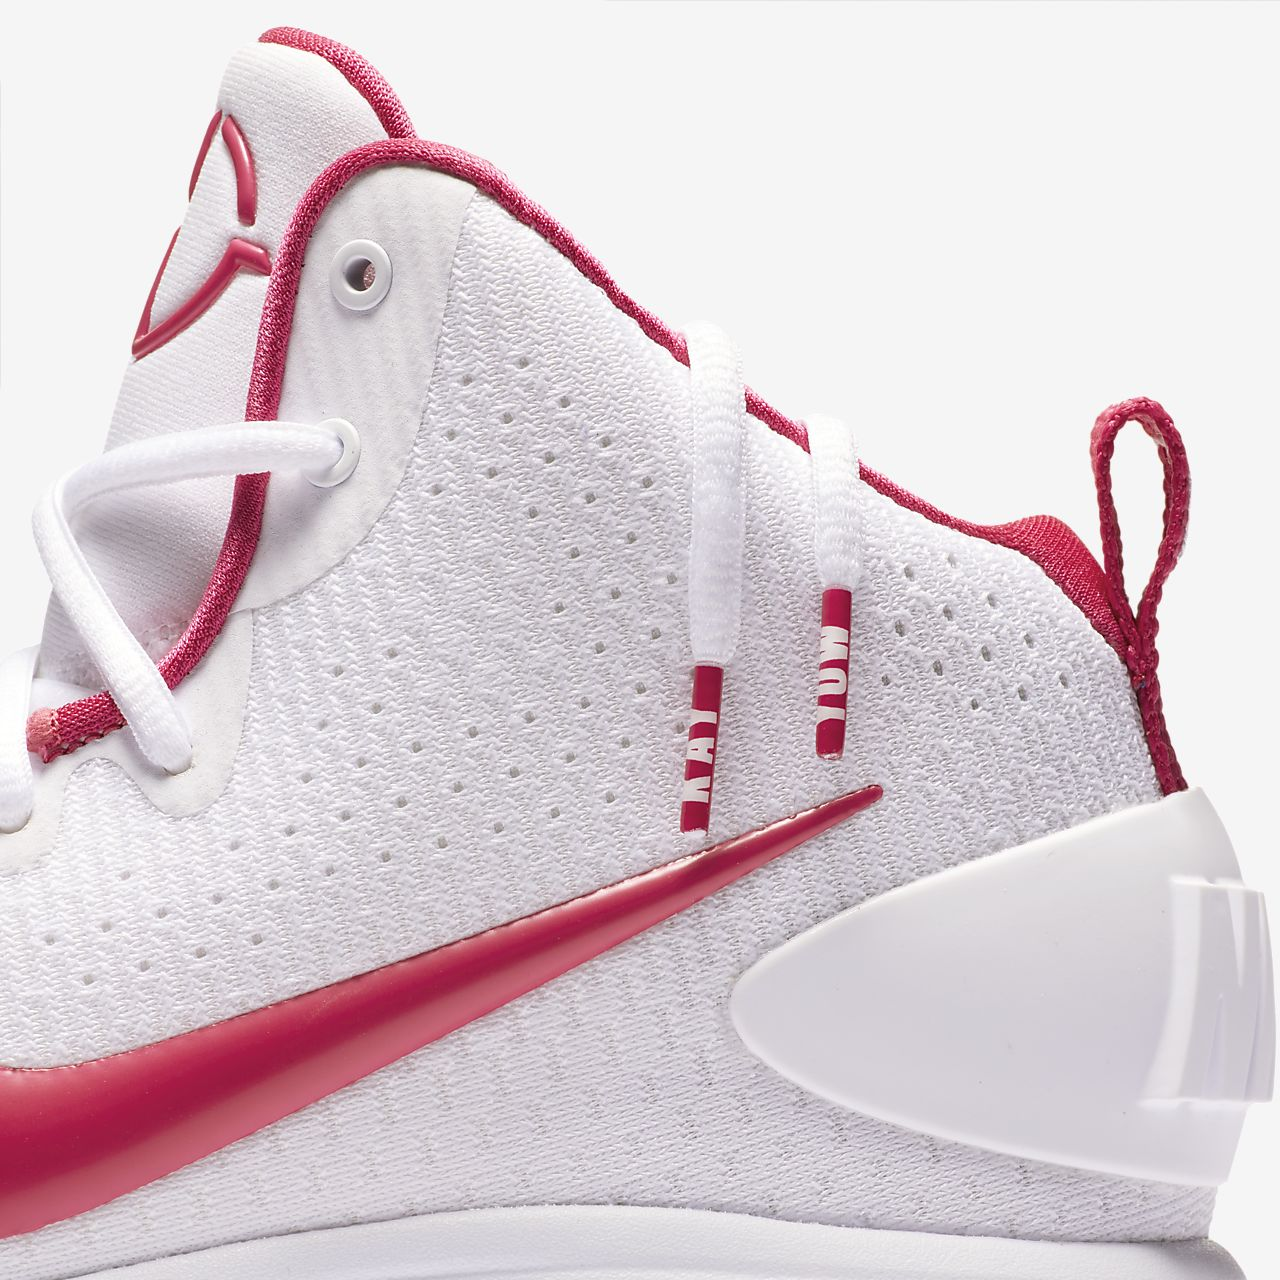 8a4b3b9ed76f Nike Hyperdunk 2017 Kay Yow Basketball Shoe ...